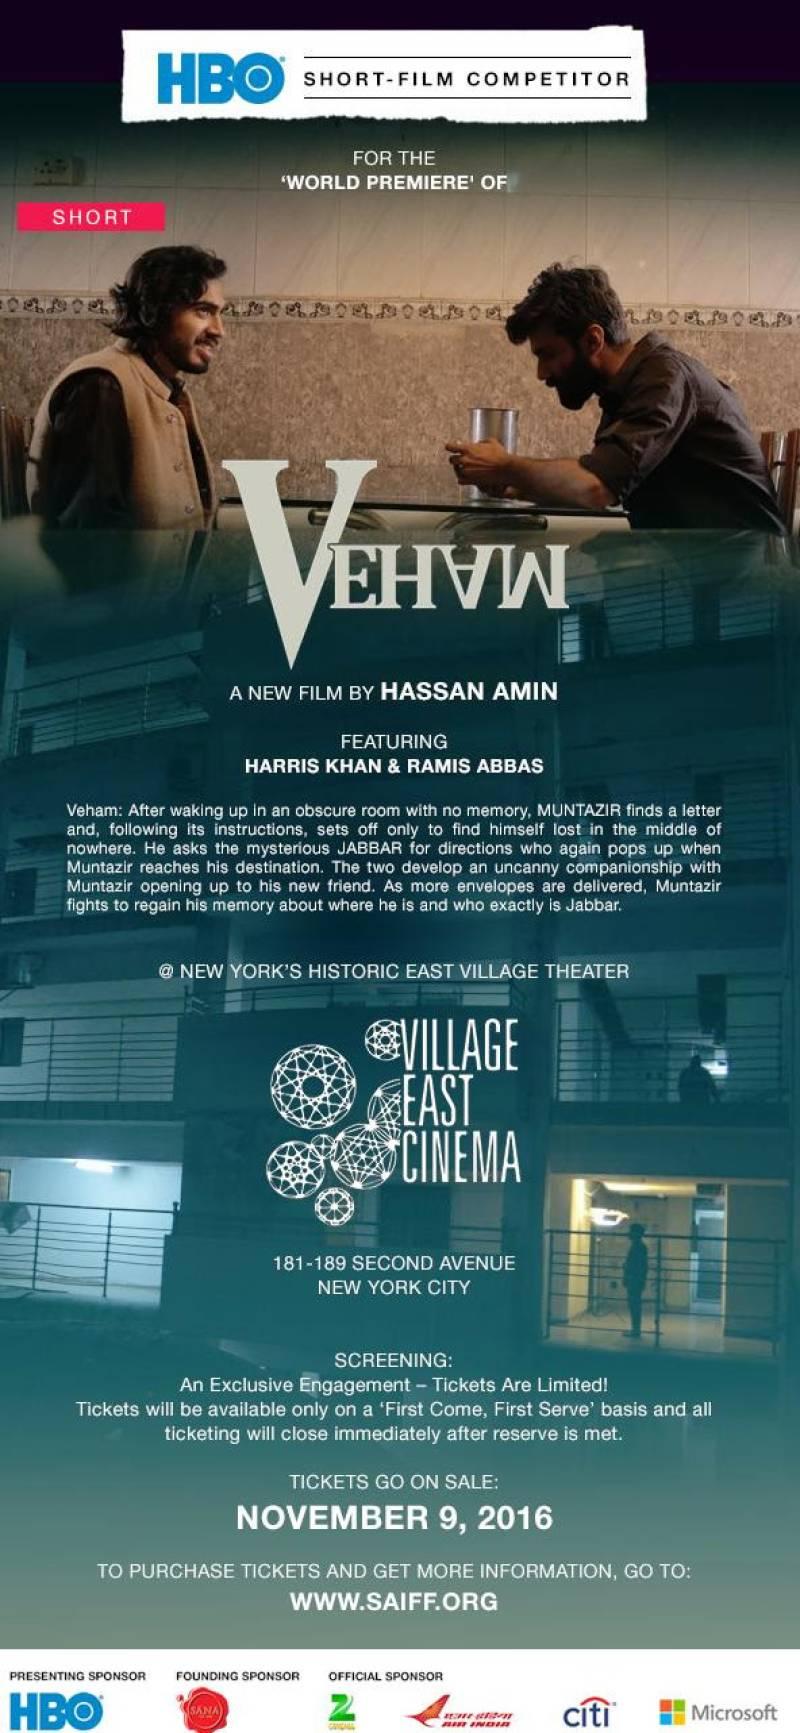 Pakistani musician & filmmaker Hassan Amin's movie 'Veham' will be premiering at the South Asian International Film Festival